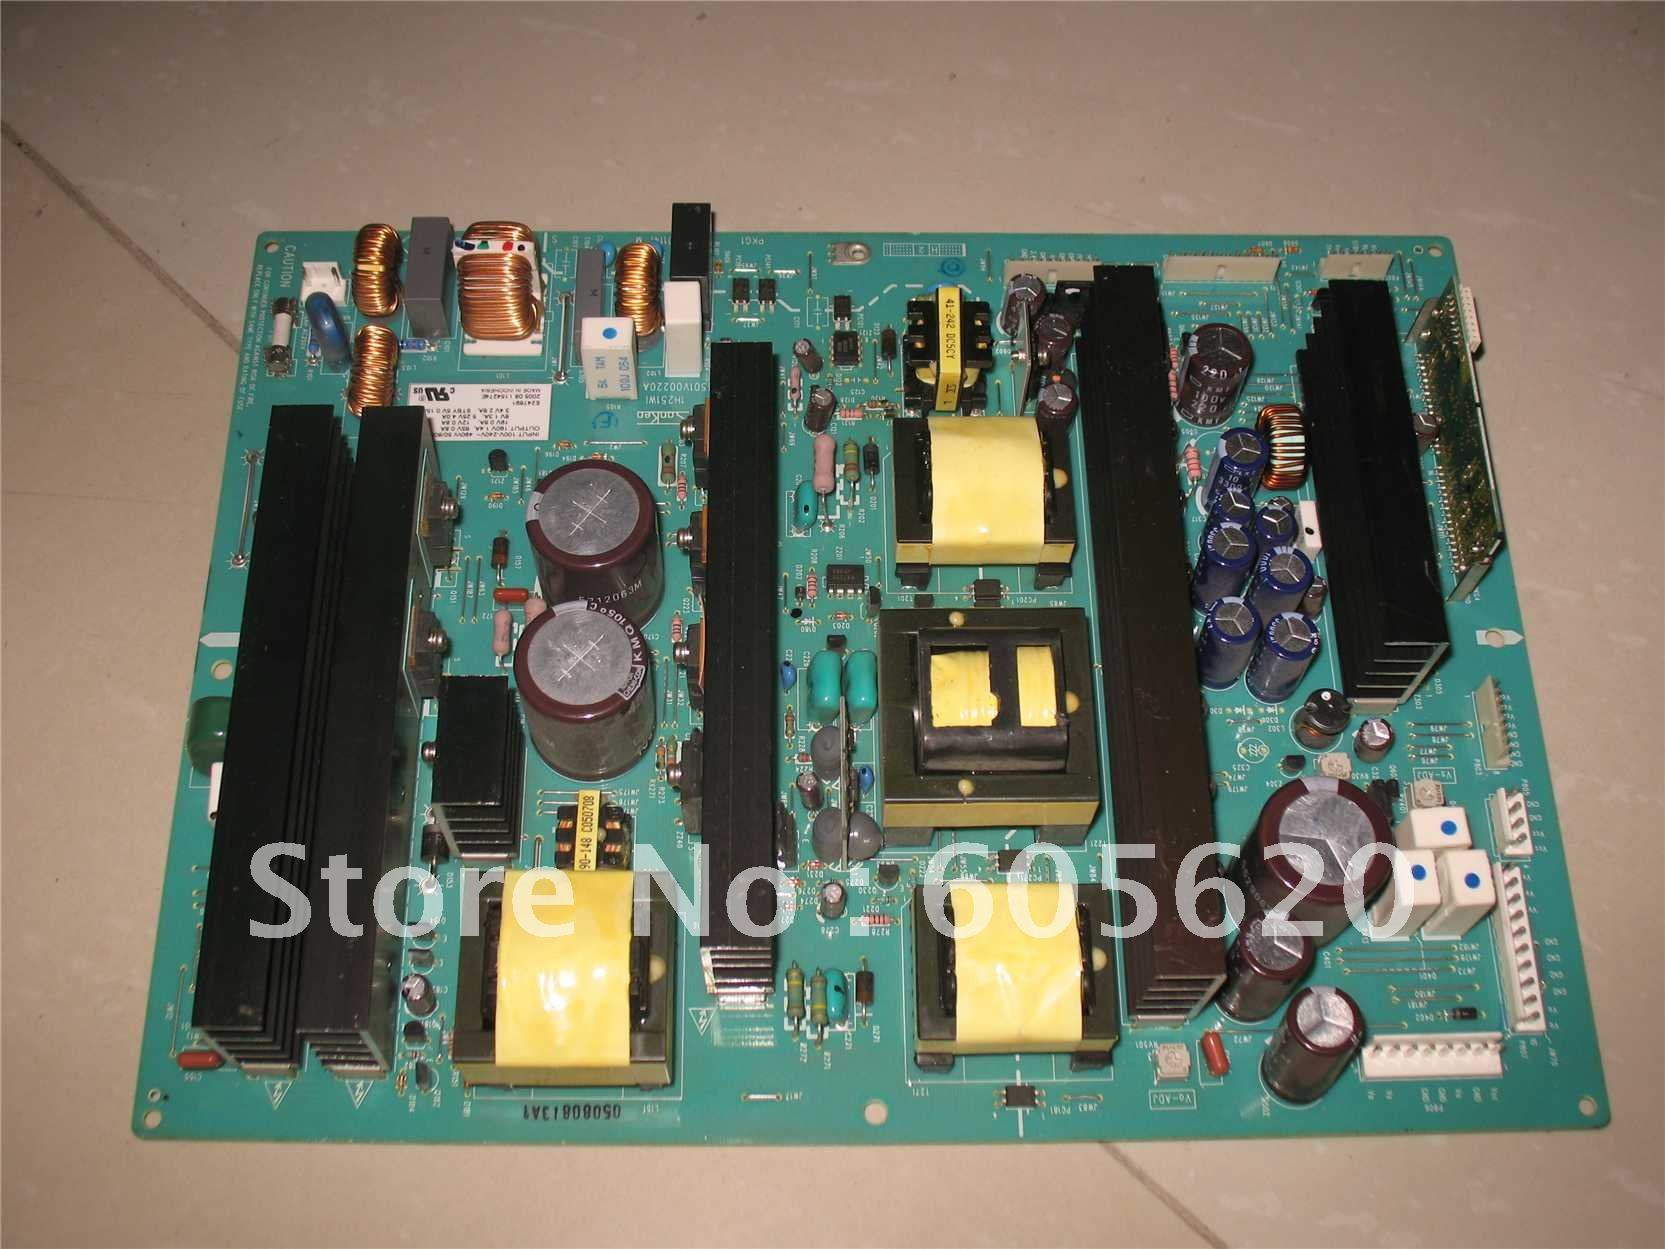 Электродетали PDP 42V7 3501V00220A 1H251WI PKG1